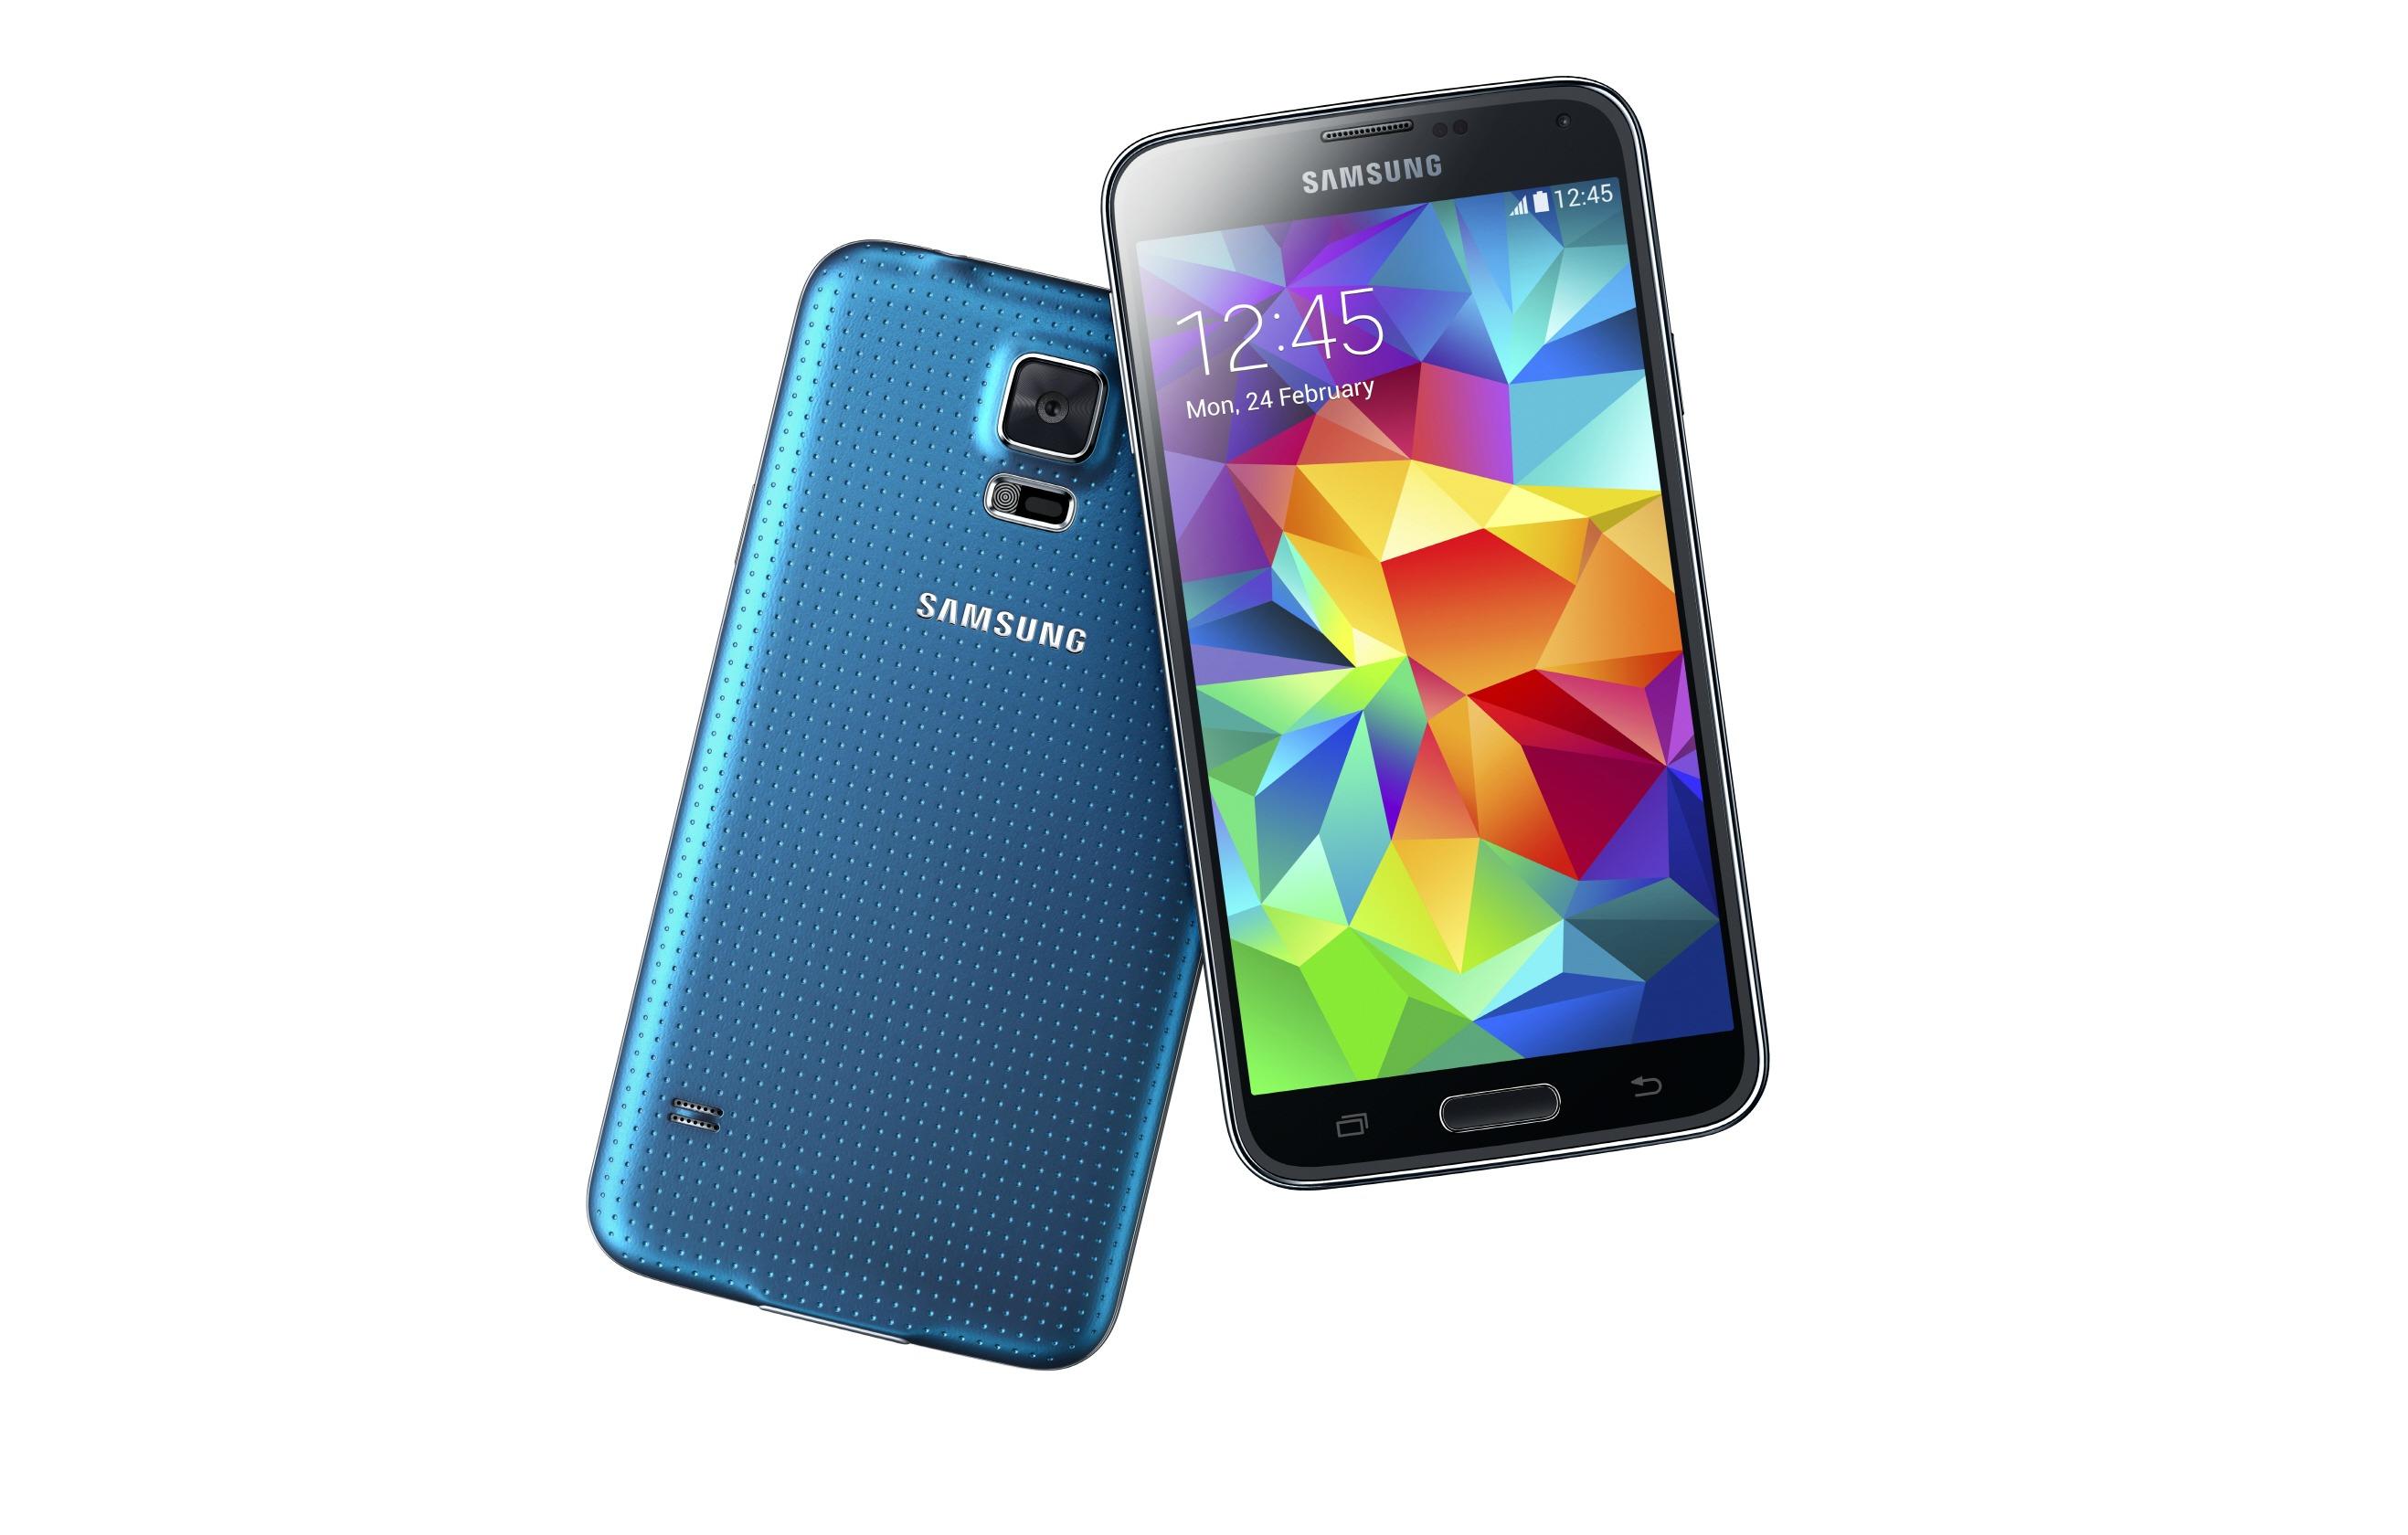 Jagat Review Yossie Dwi P Nokia Asha 501 Dual Sim Resmi Bright Red Samsung Galaxy S5 Blue